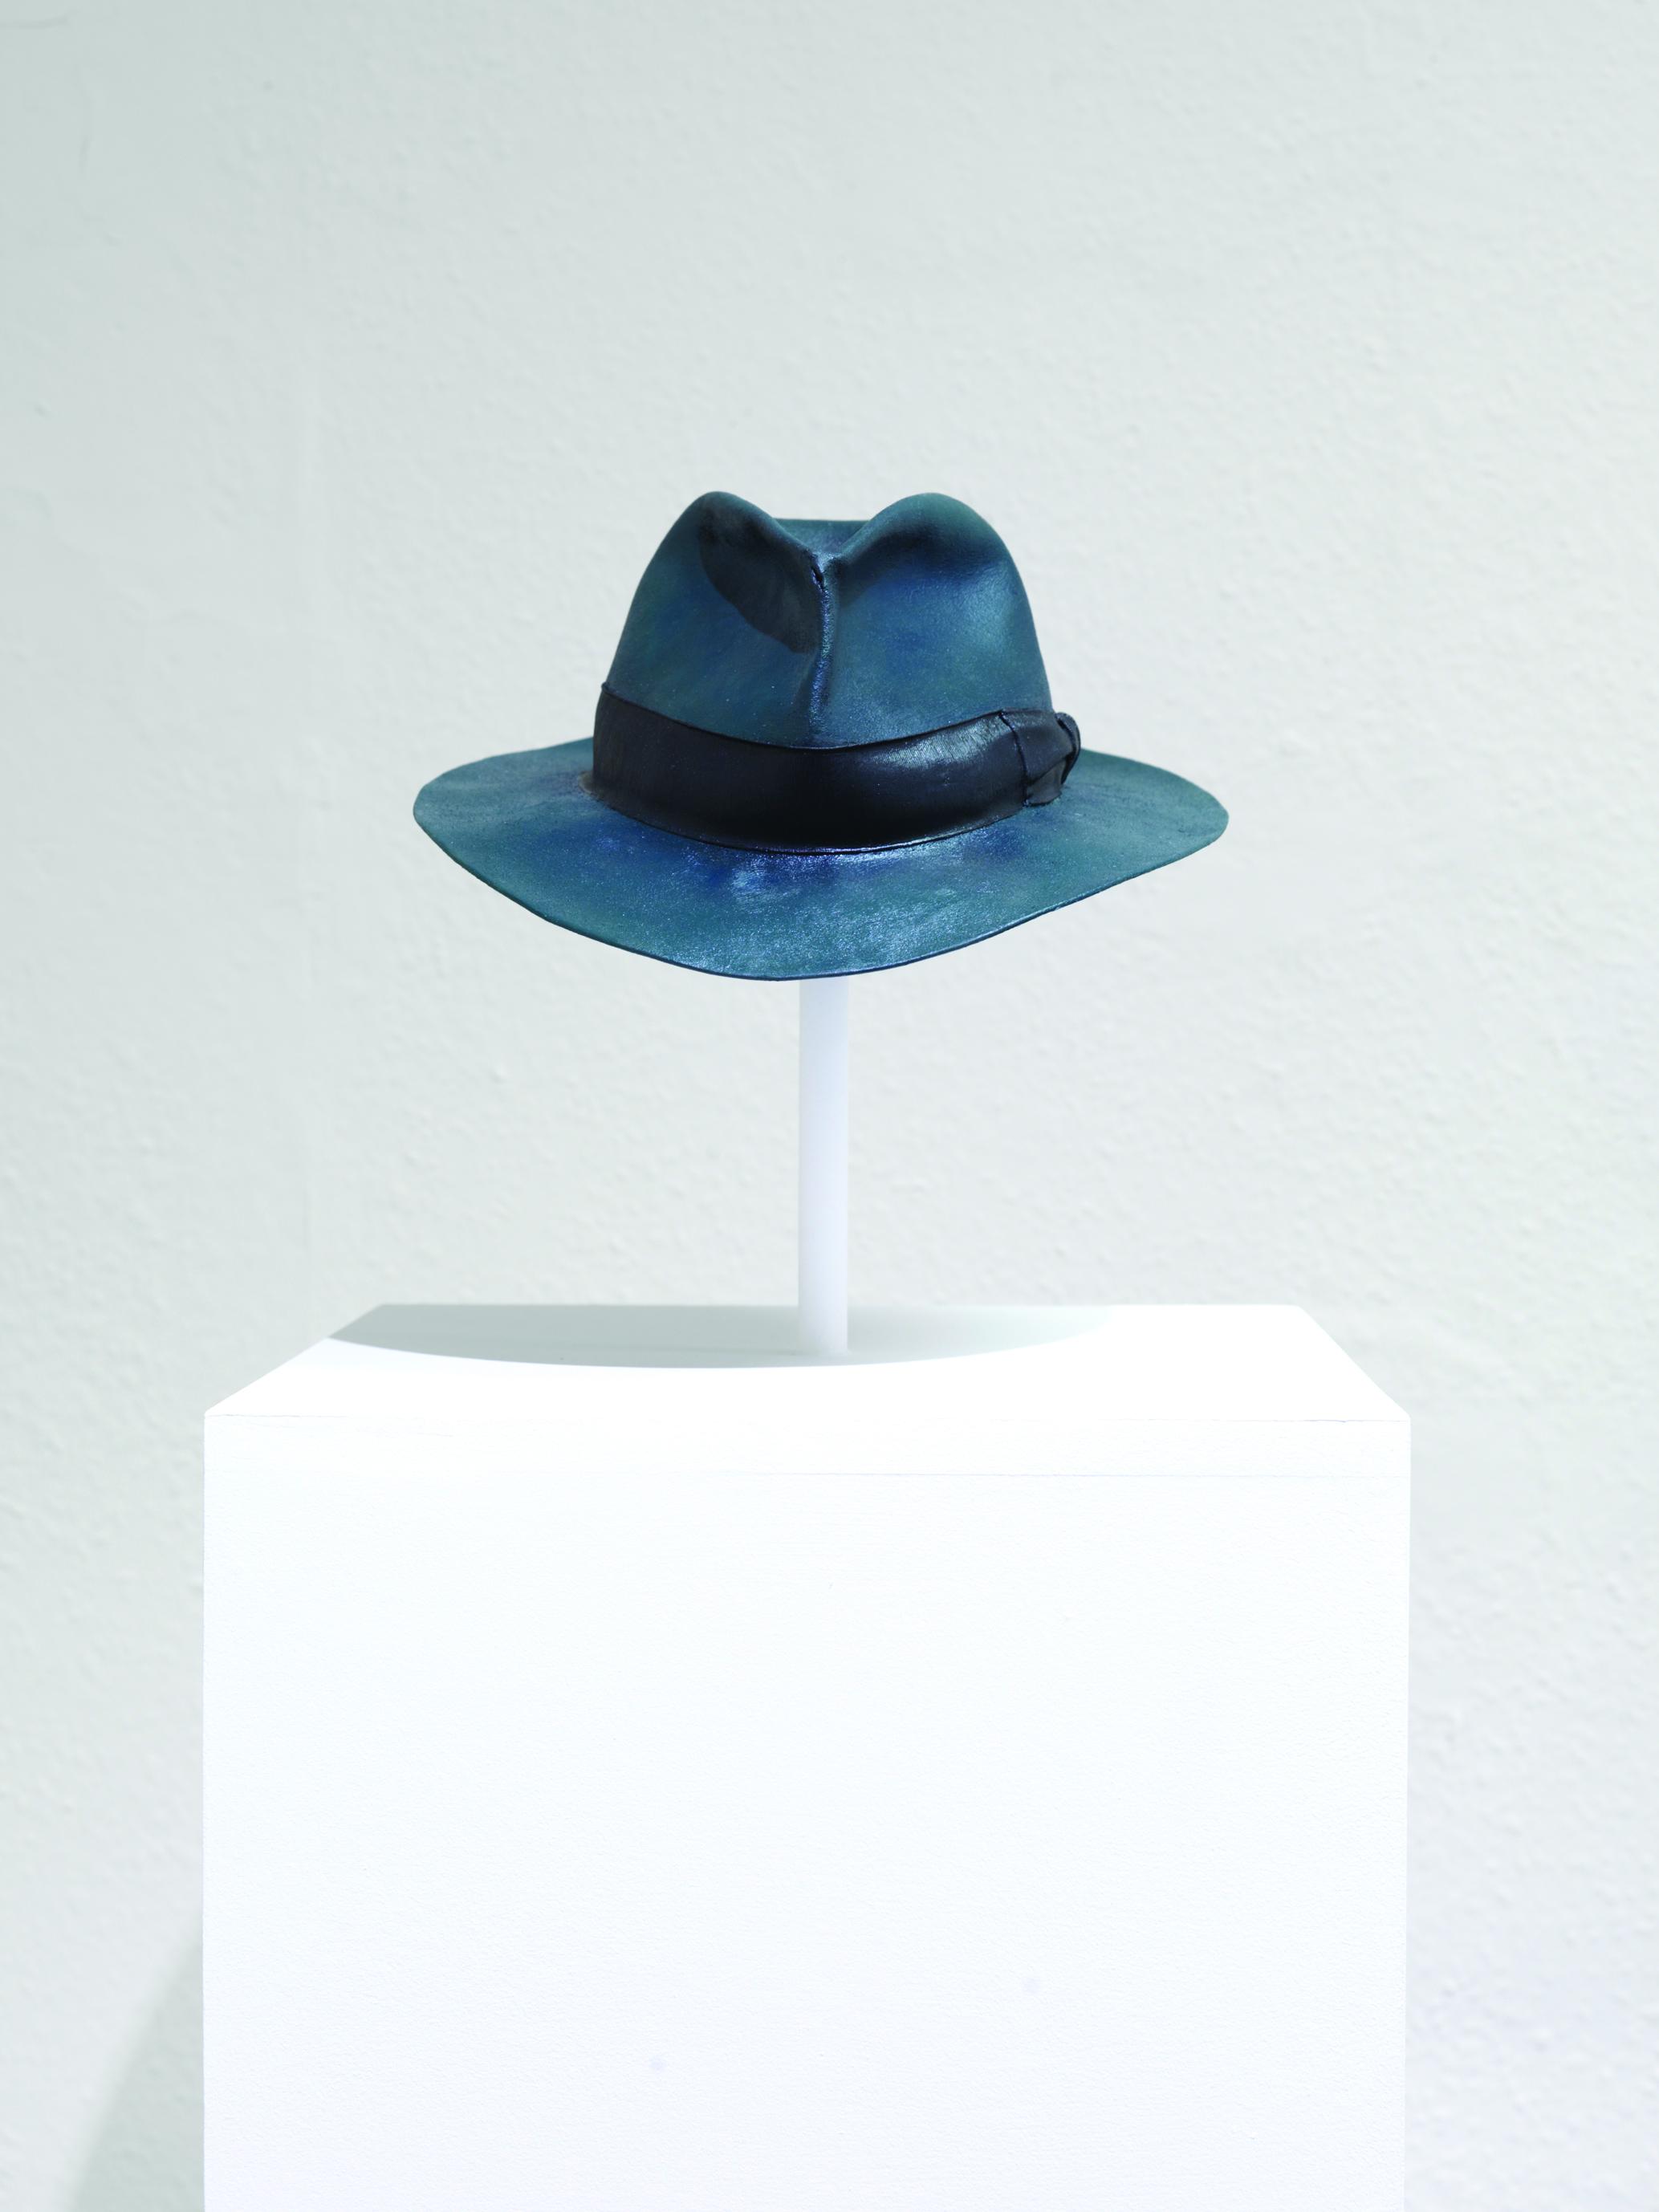 Map (Watson's Hat) 2008, felt hat, oil paint, 290 x 320 x 130mm.